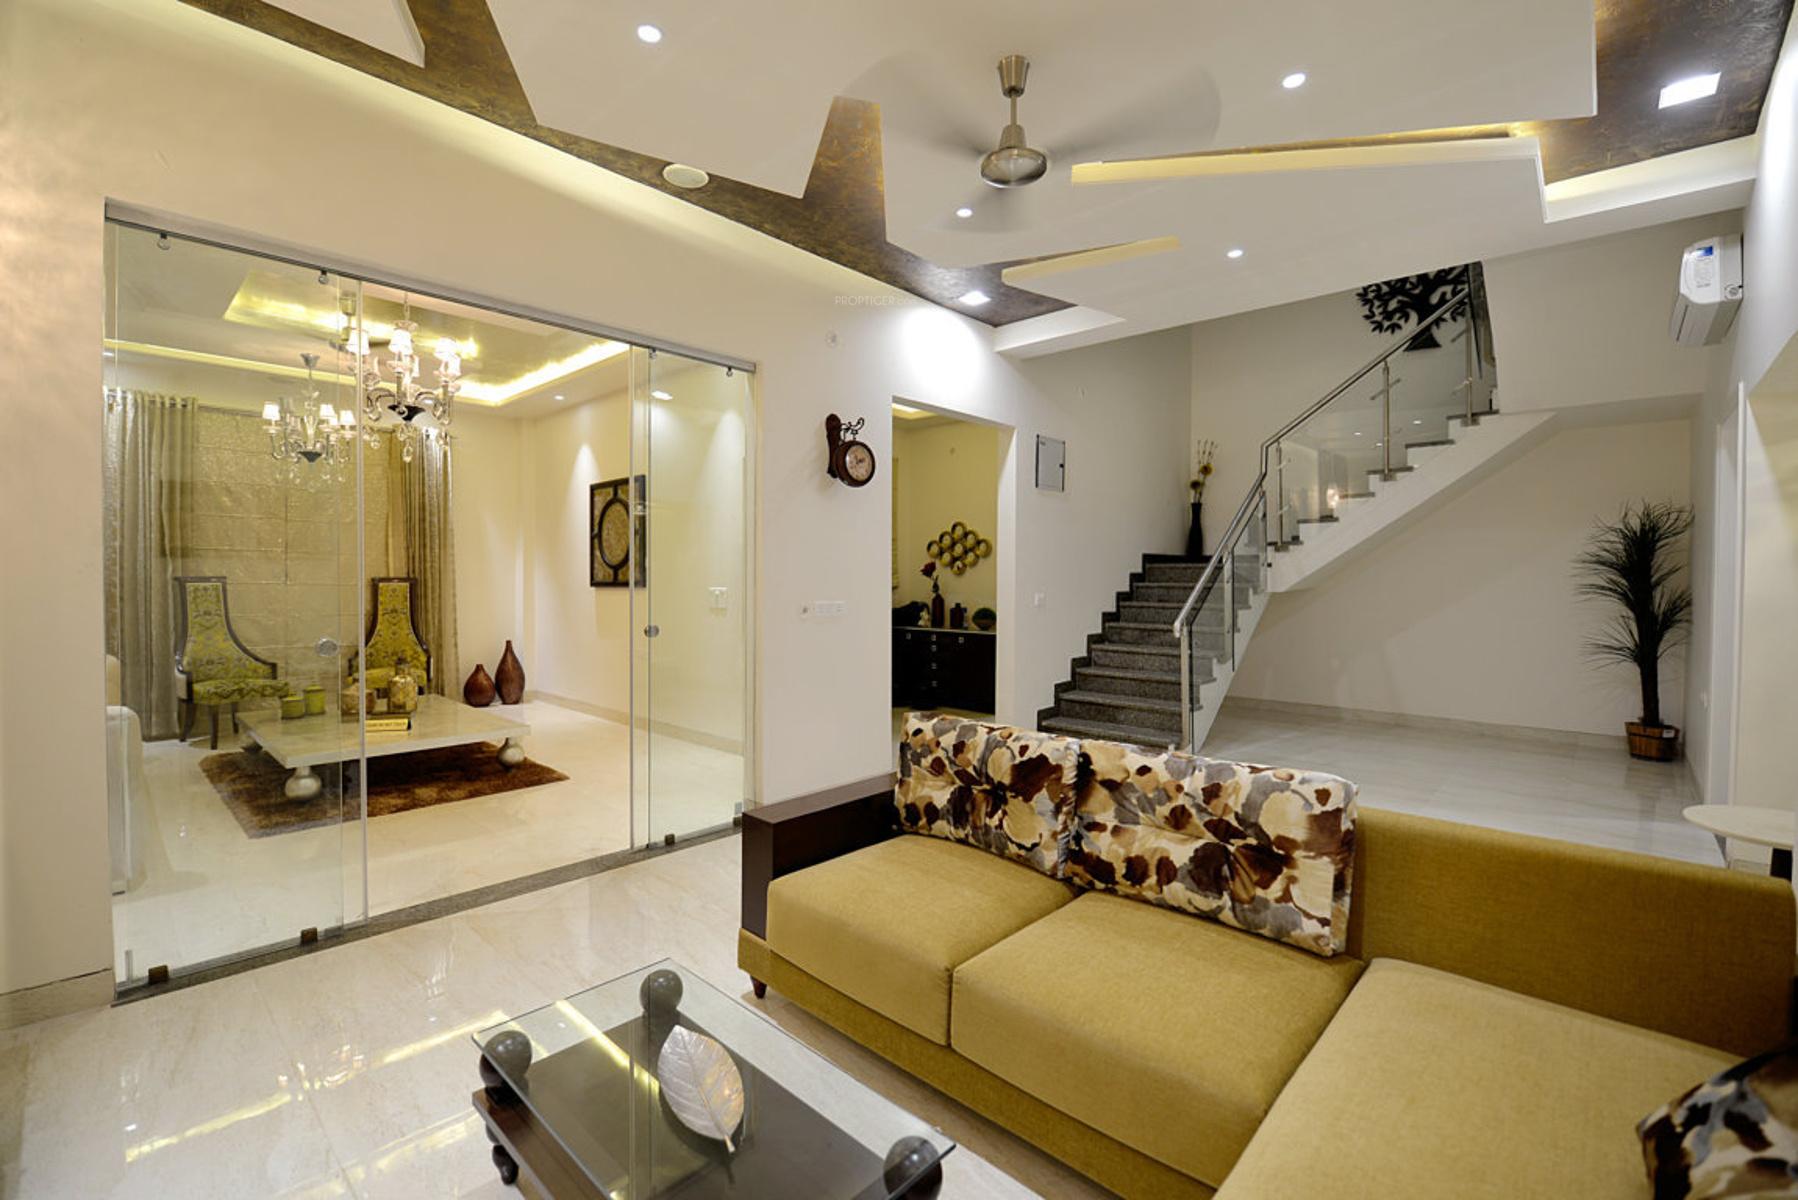 Manglam aangan prime villa in ajmer road jaipur price - Home design plans with photos in india ...